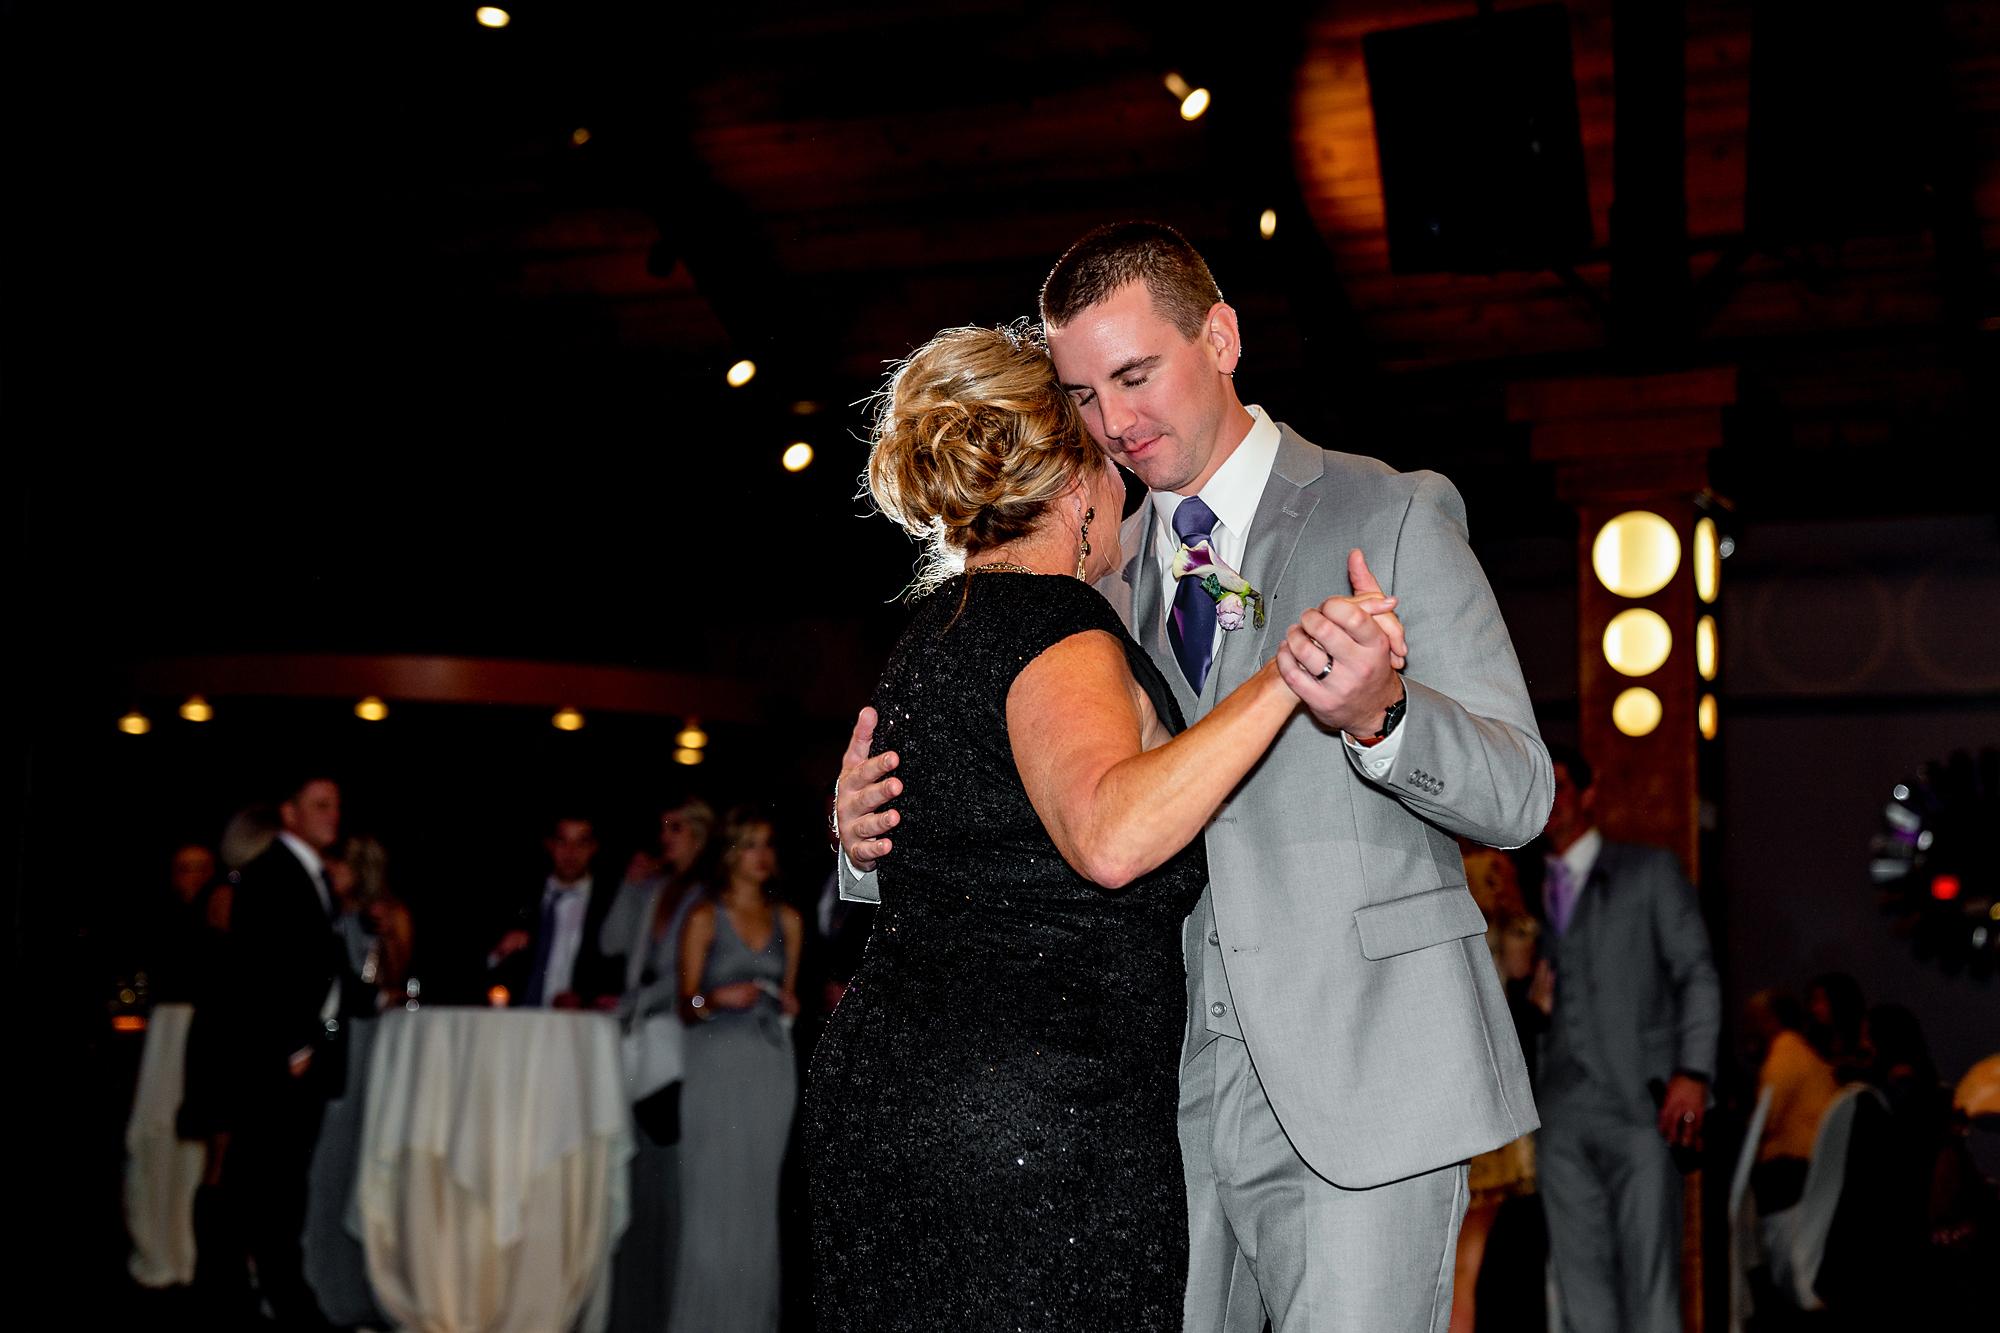 The-Pinnacle-Ballroom-Covington-KY-Wedding-Photography-20.jpg